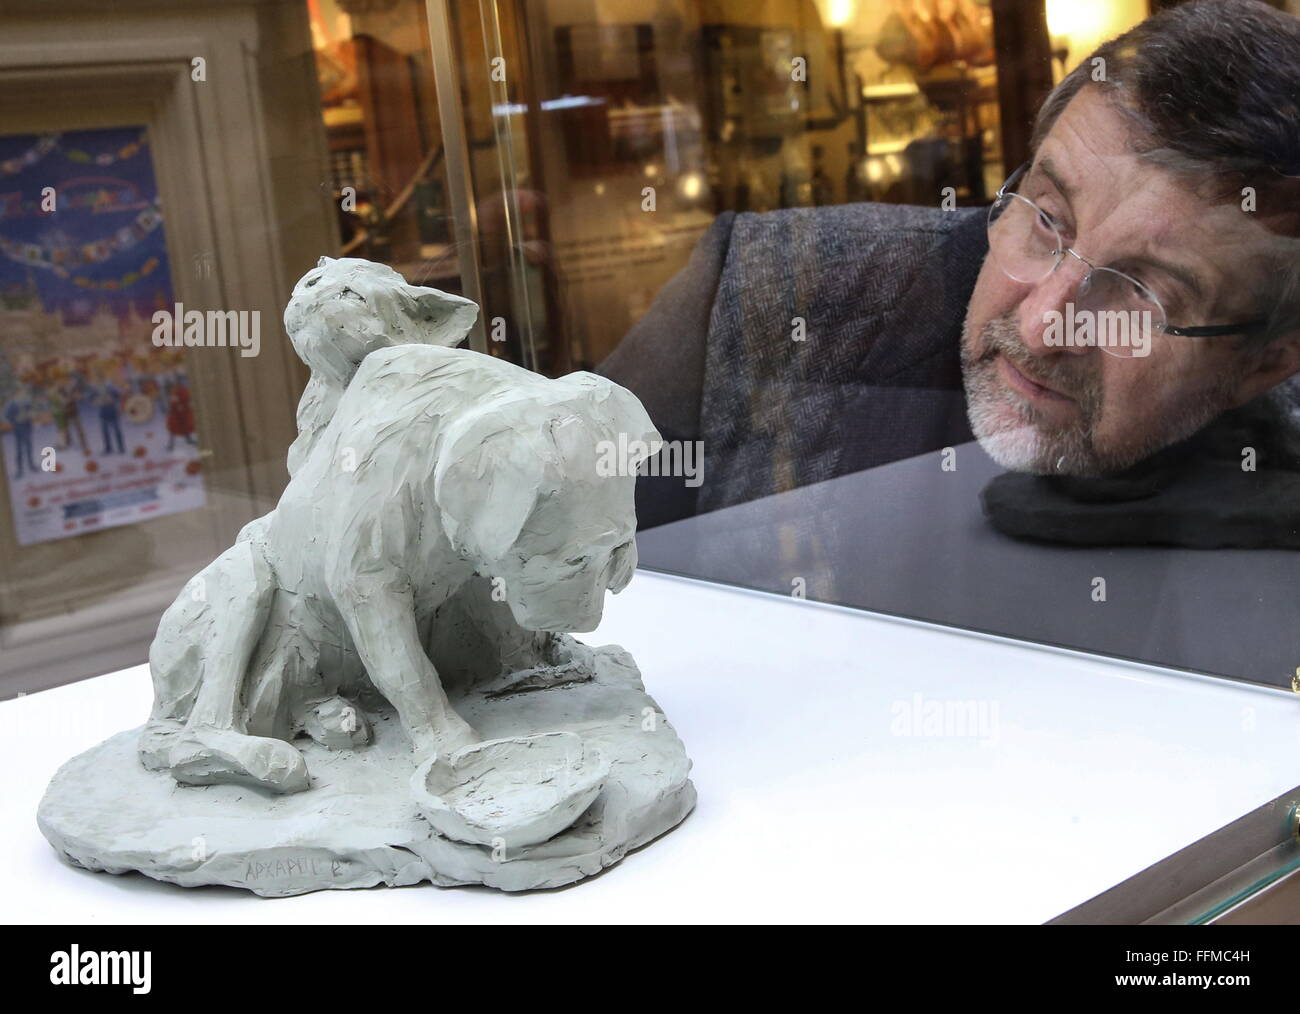 Leonid Yarmolnik dogs bitten by a 2-year-old girl 29.06.2010 68